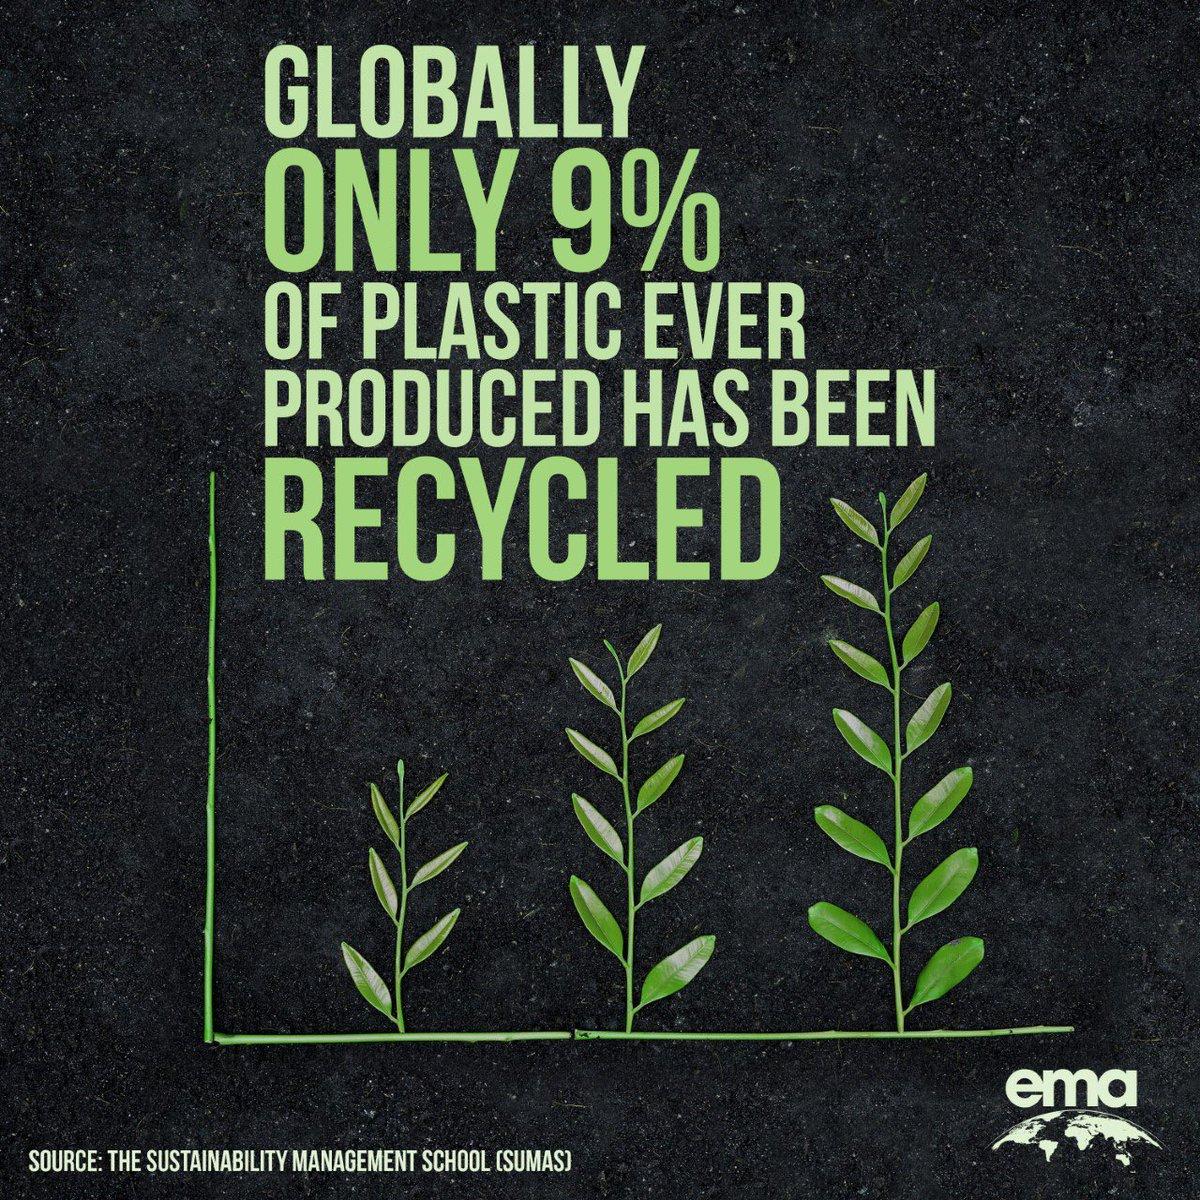 We've got work to do: @green4EMA